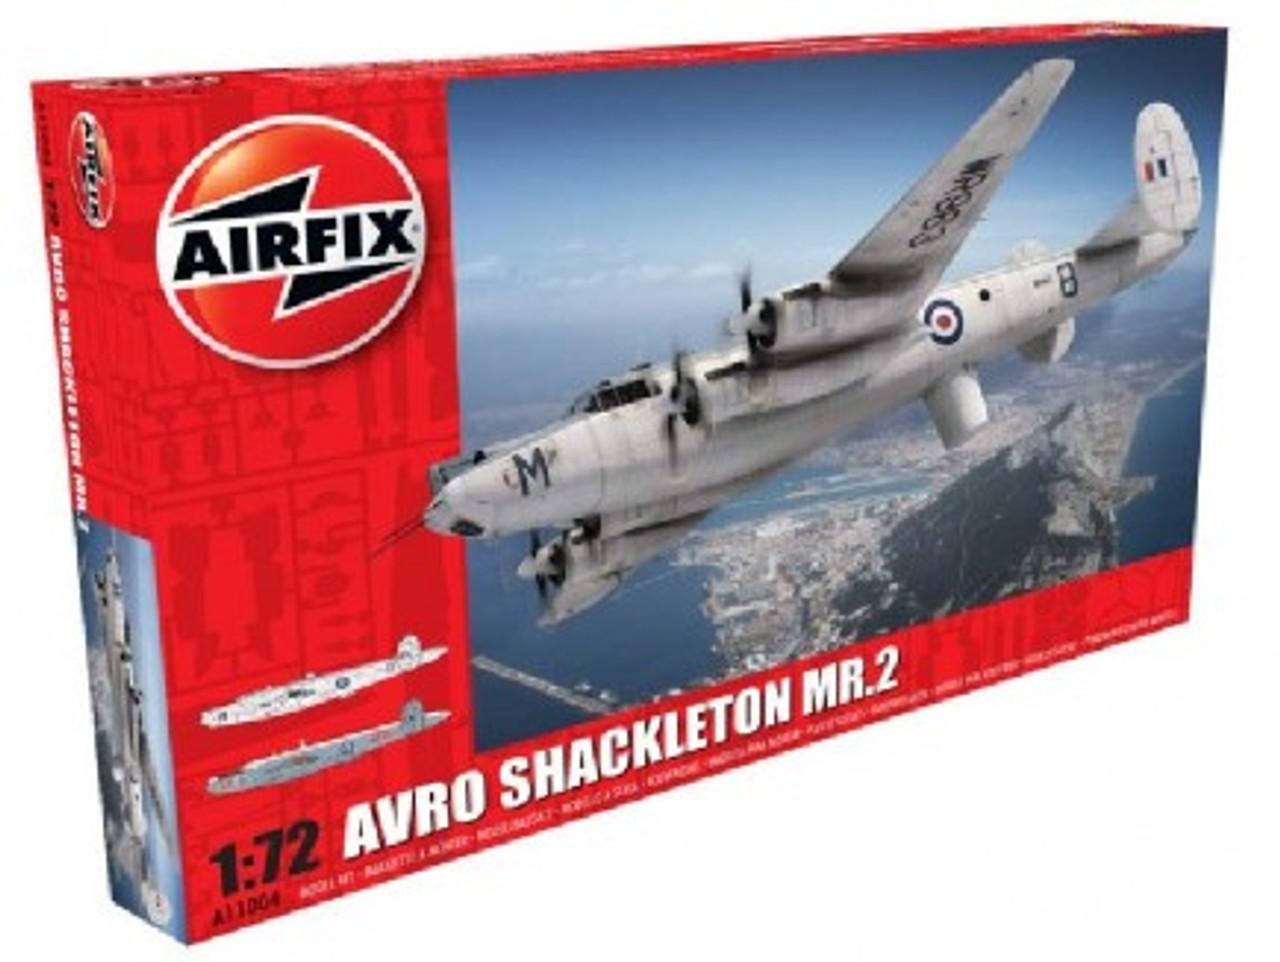 ARX-11004  1/72 Avro Shackleton MR2 British Long-Range Patrol Aircraft